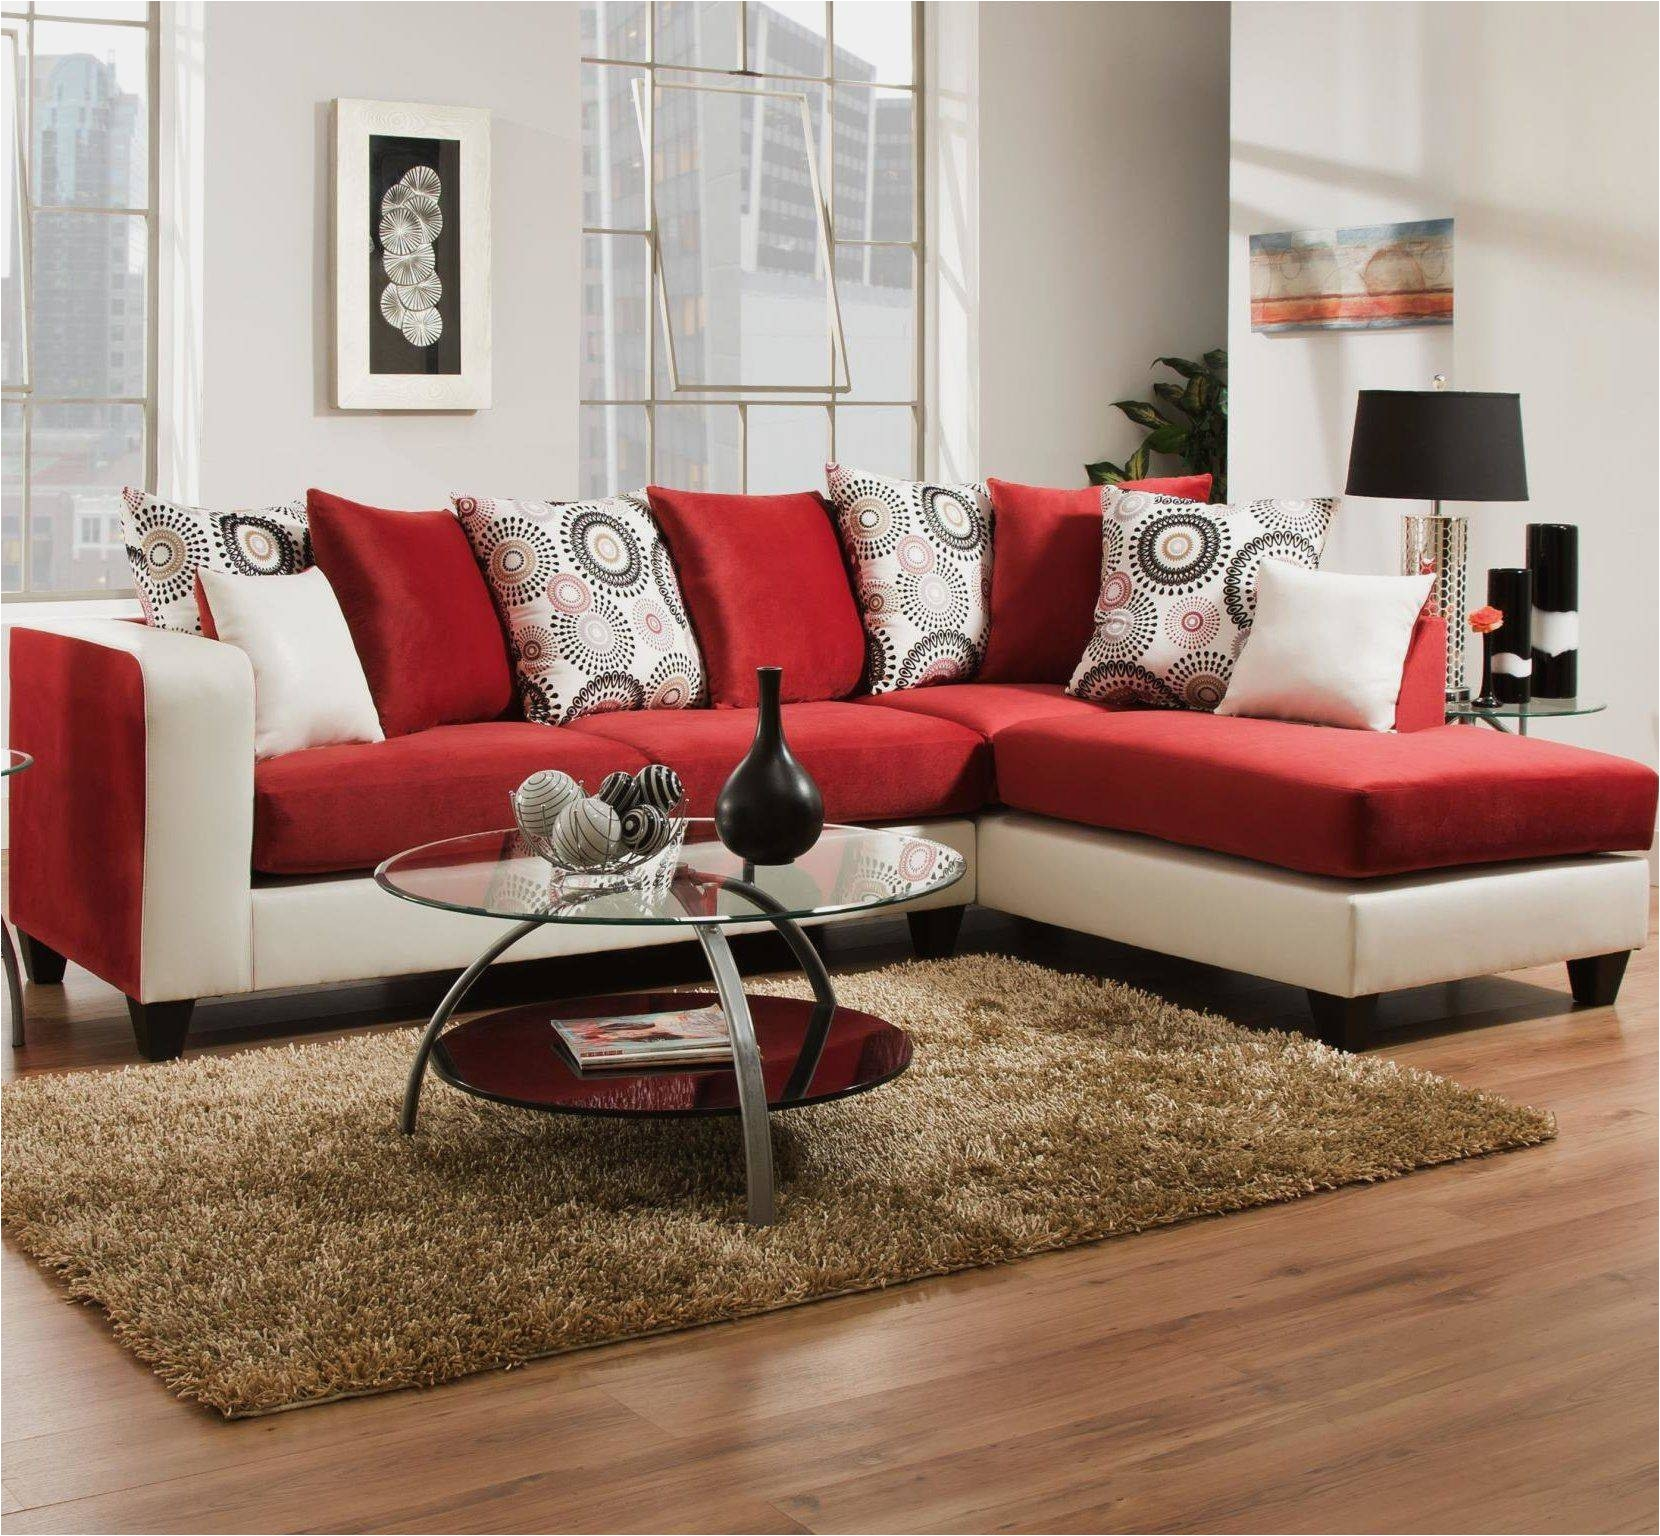 badcock furniture sales ad best of 33 inspirational badcock bedroom furniture design modern day image of